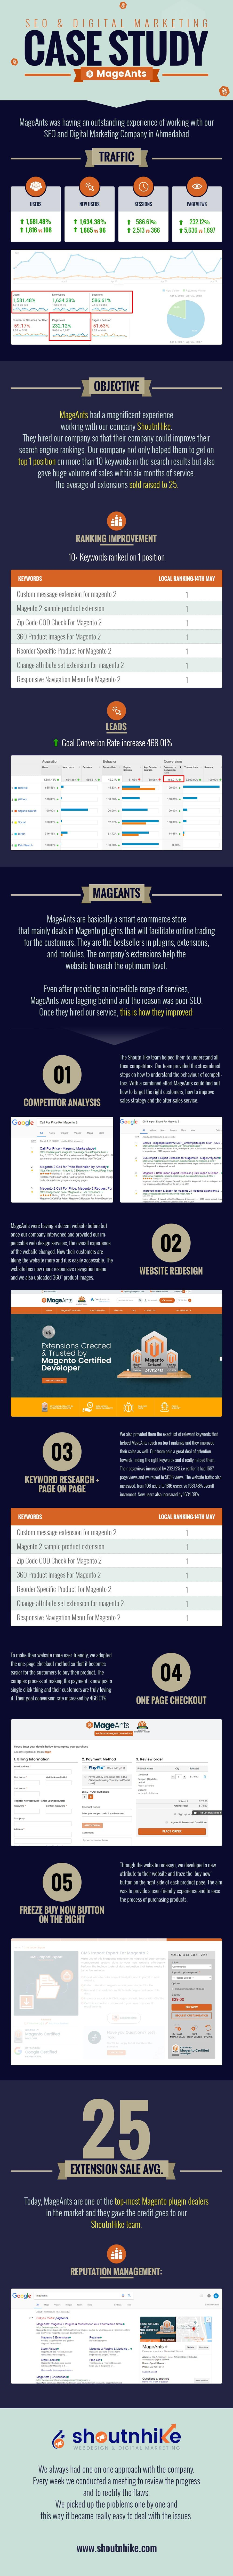 MageAnts - SEO & Digital Marketing Case Study